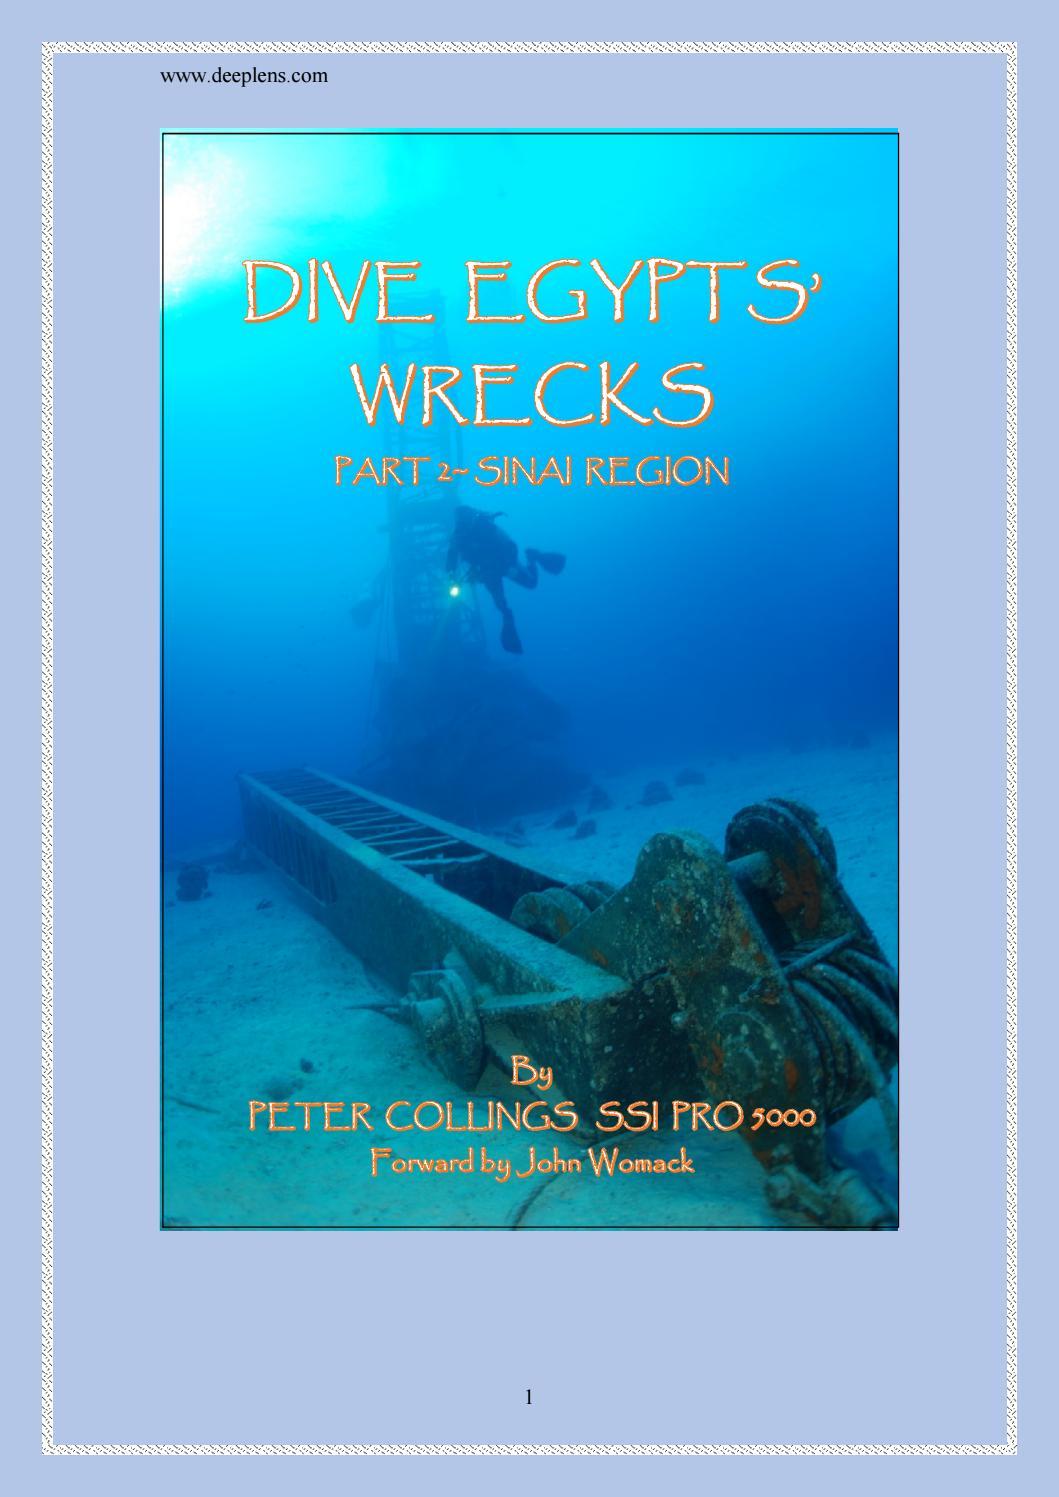 Dive Egypt Shipwrecks - Part 2 - Sinai Region (Hi Res